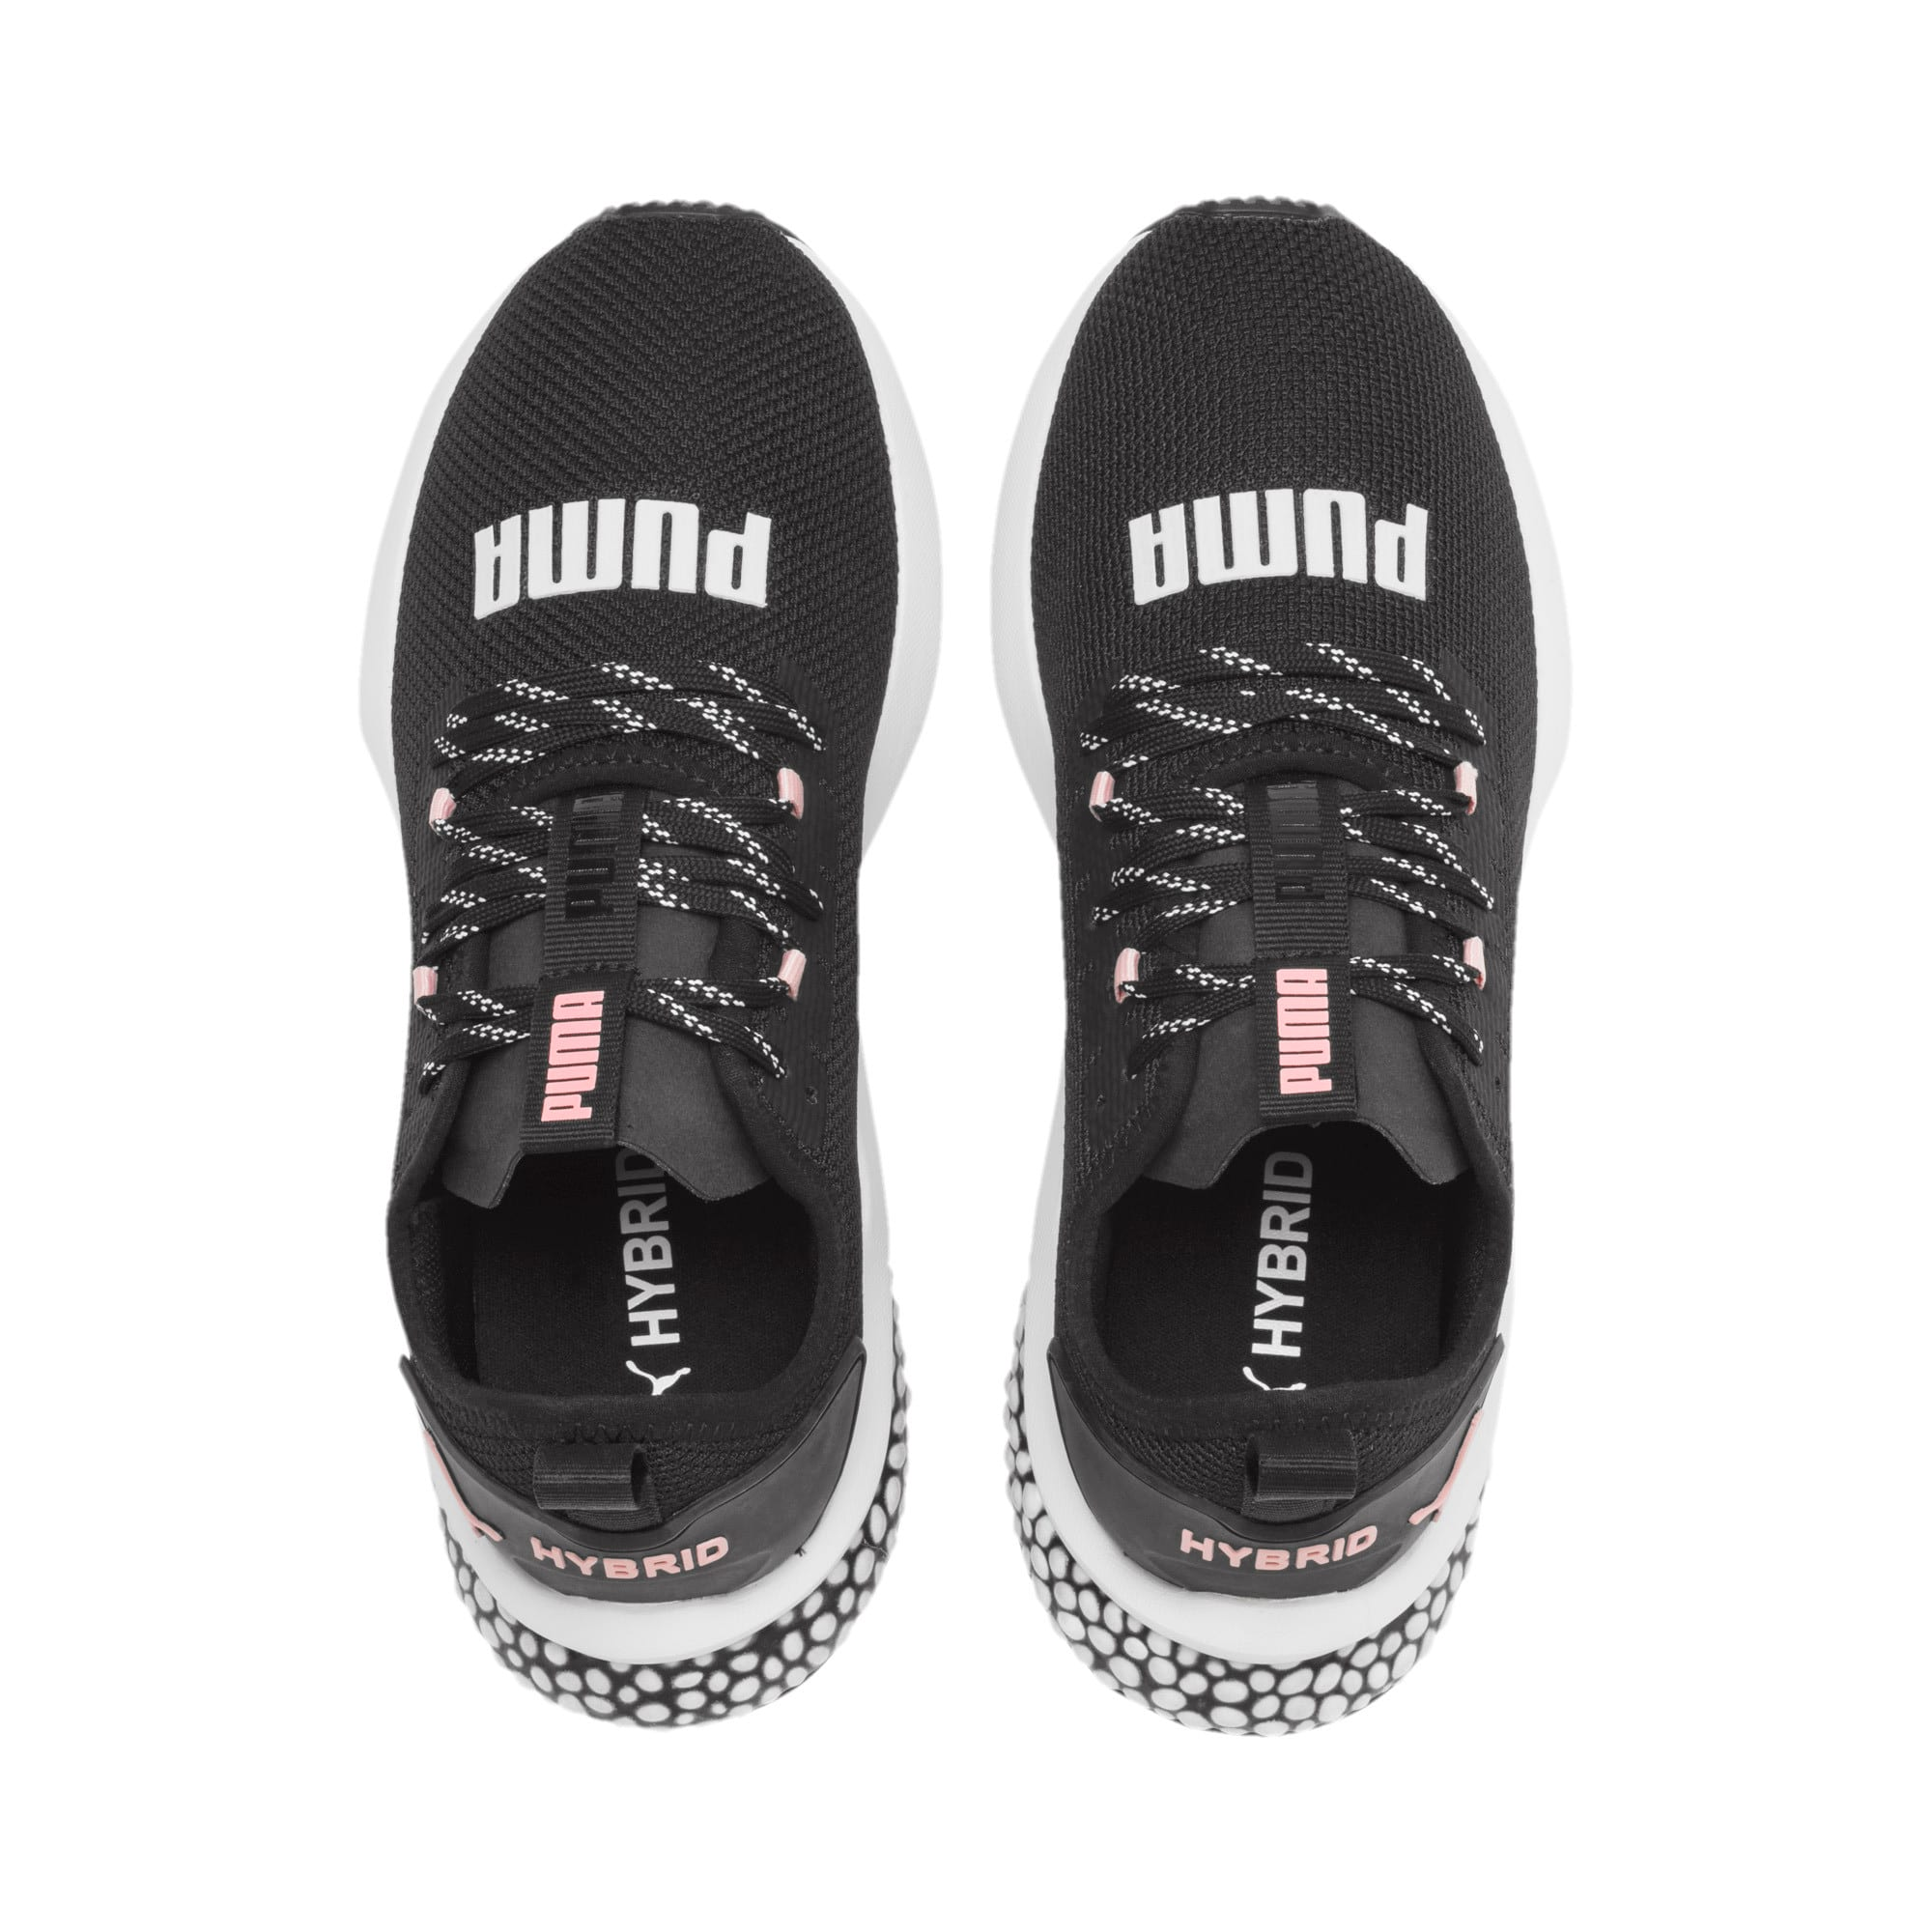 Thumbnail 7 of HYBRID NX Women's Running Shoes, Puma Black-Bridal Rose, medium